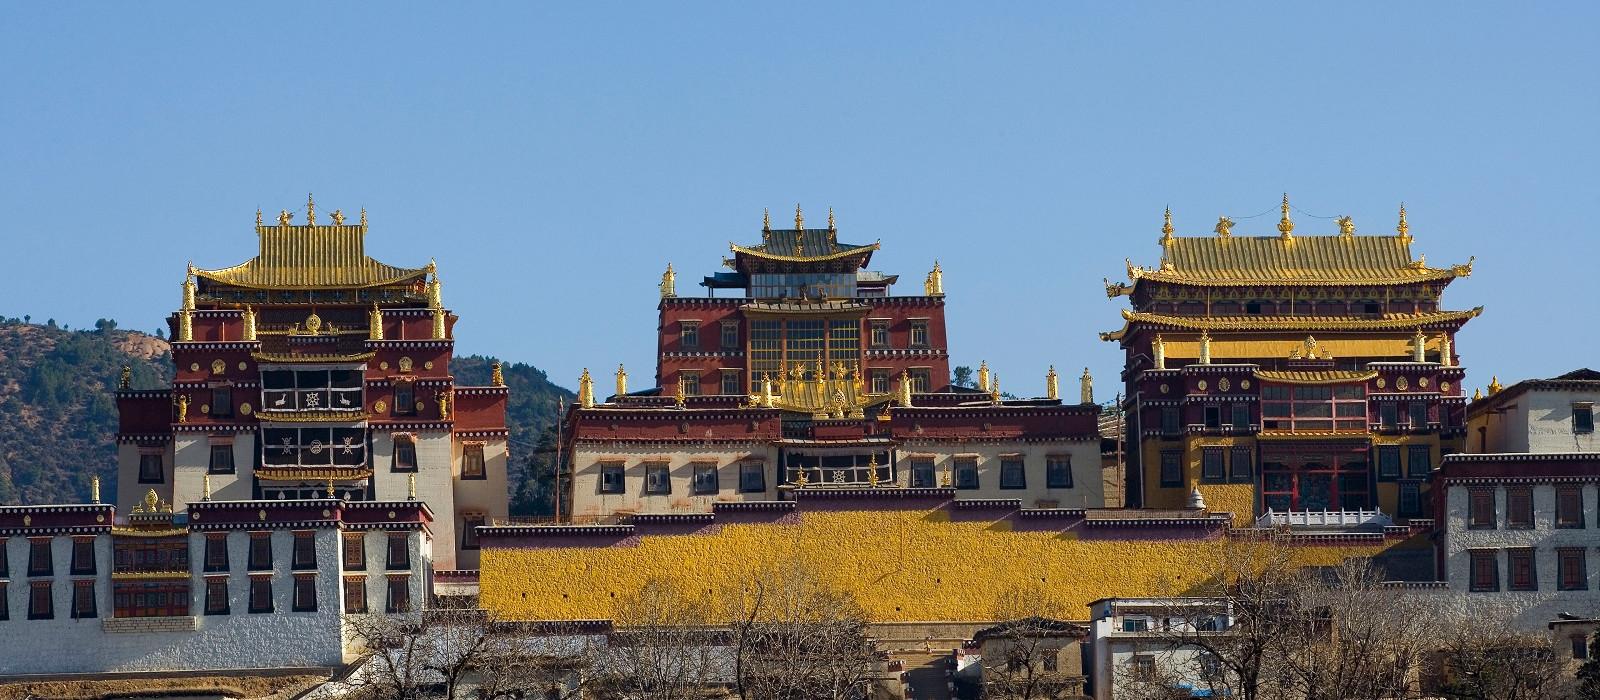 Destination Shangri-la (Zhongdian) China